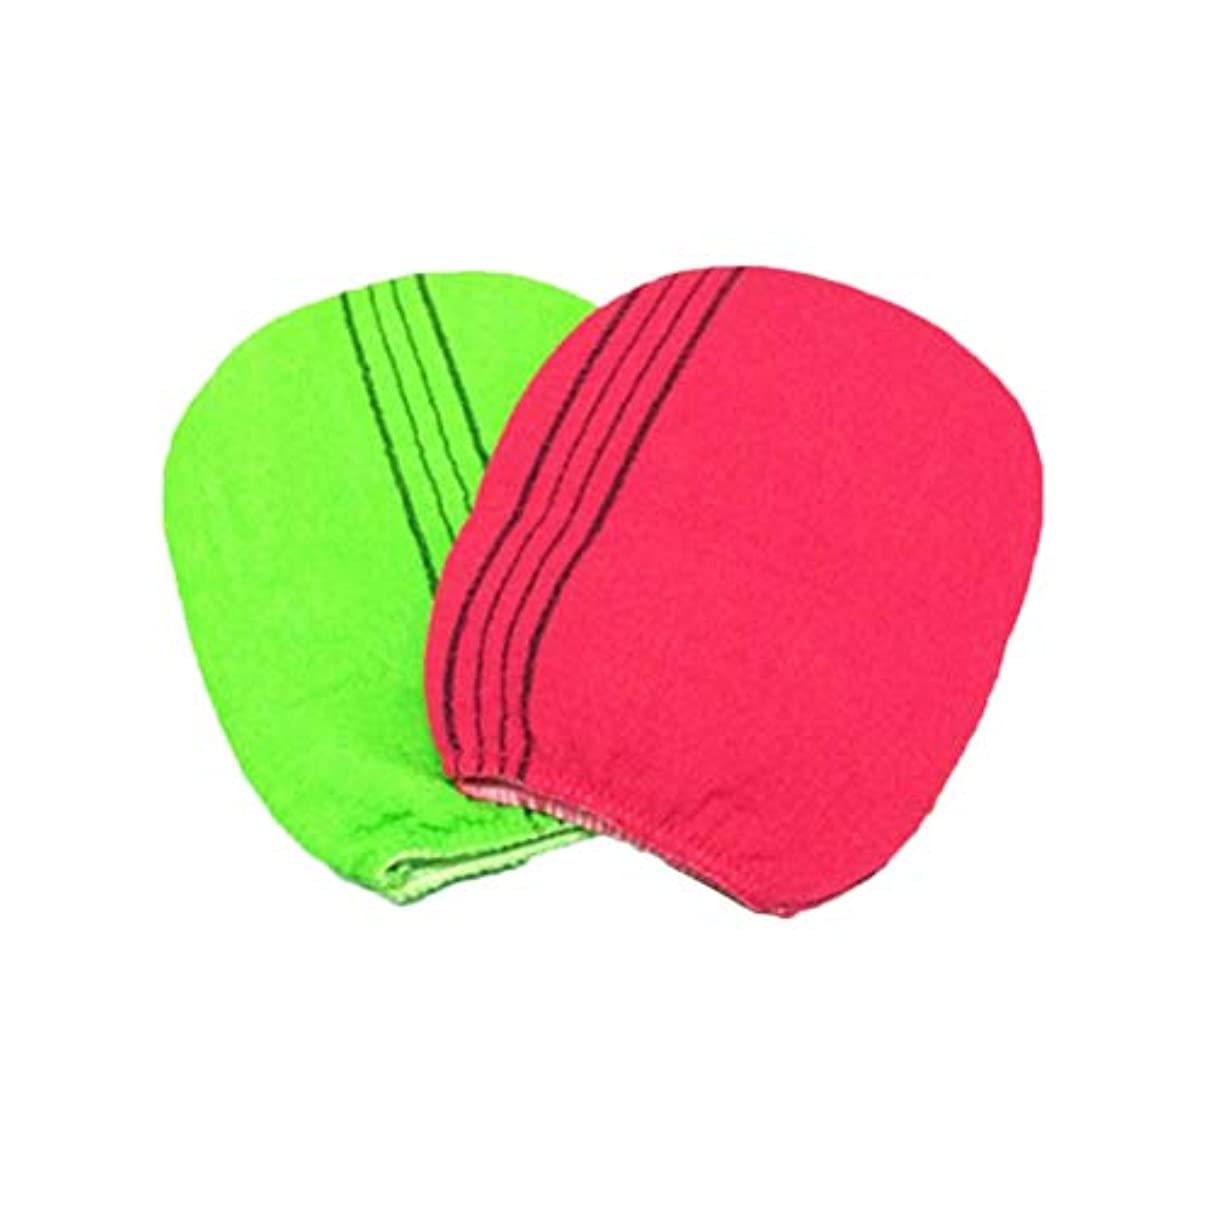 Beaupretty 2ピース入浴手袋風呂ミットラビング手袋剥離手袋シャワーバスタオル(ランダムカラー)